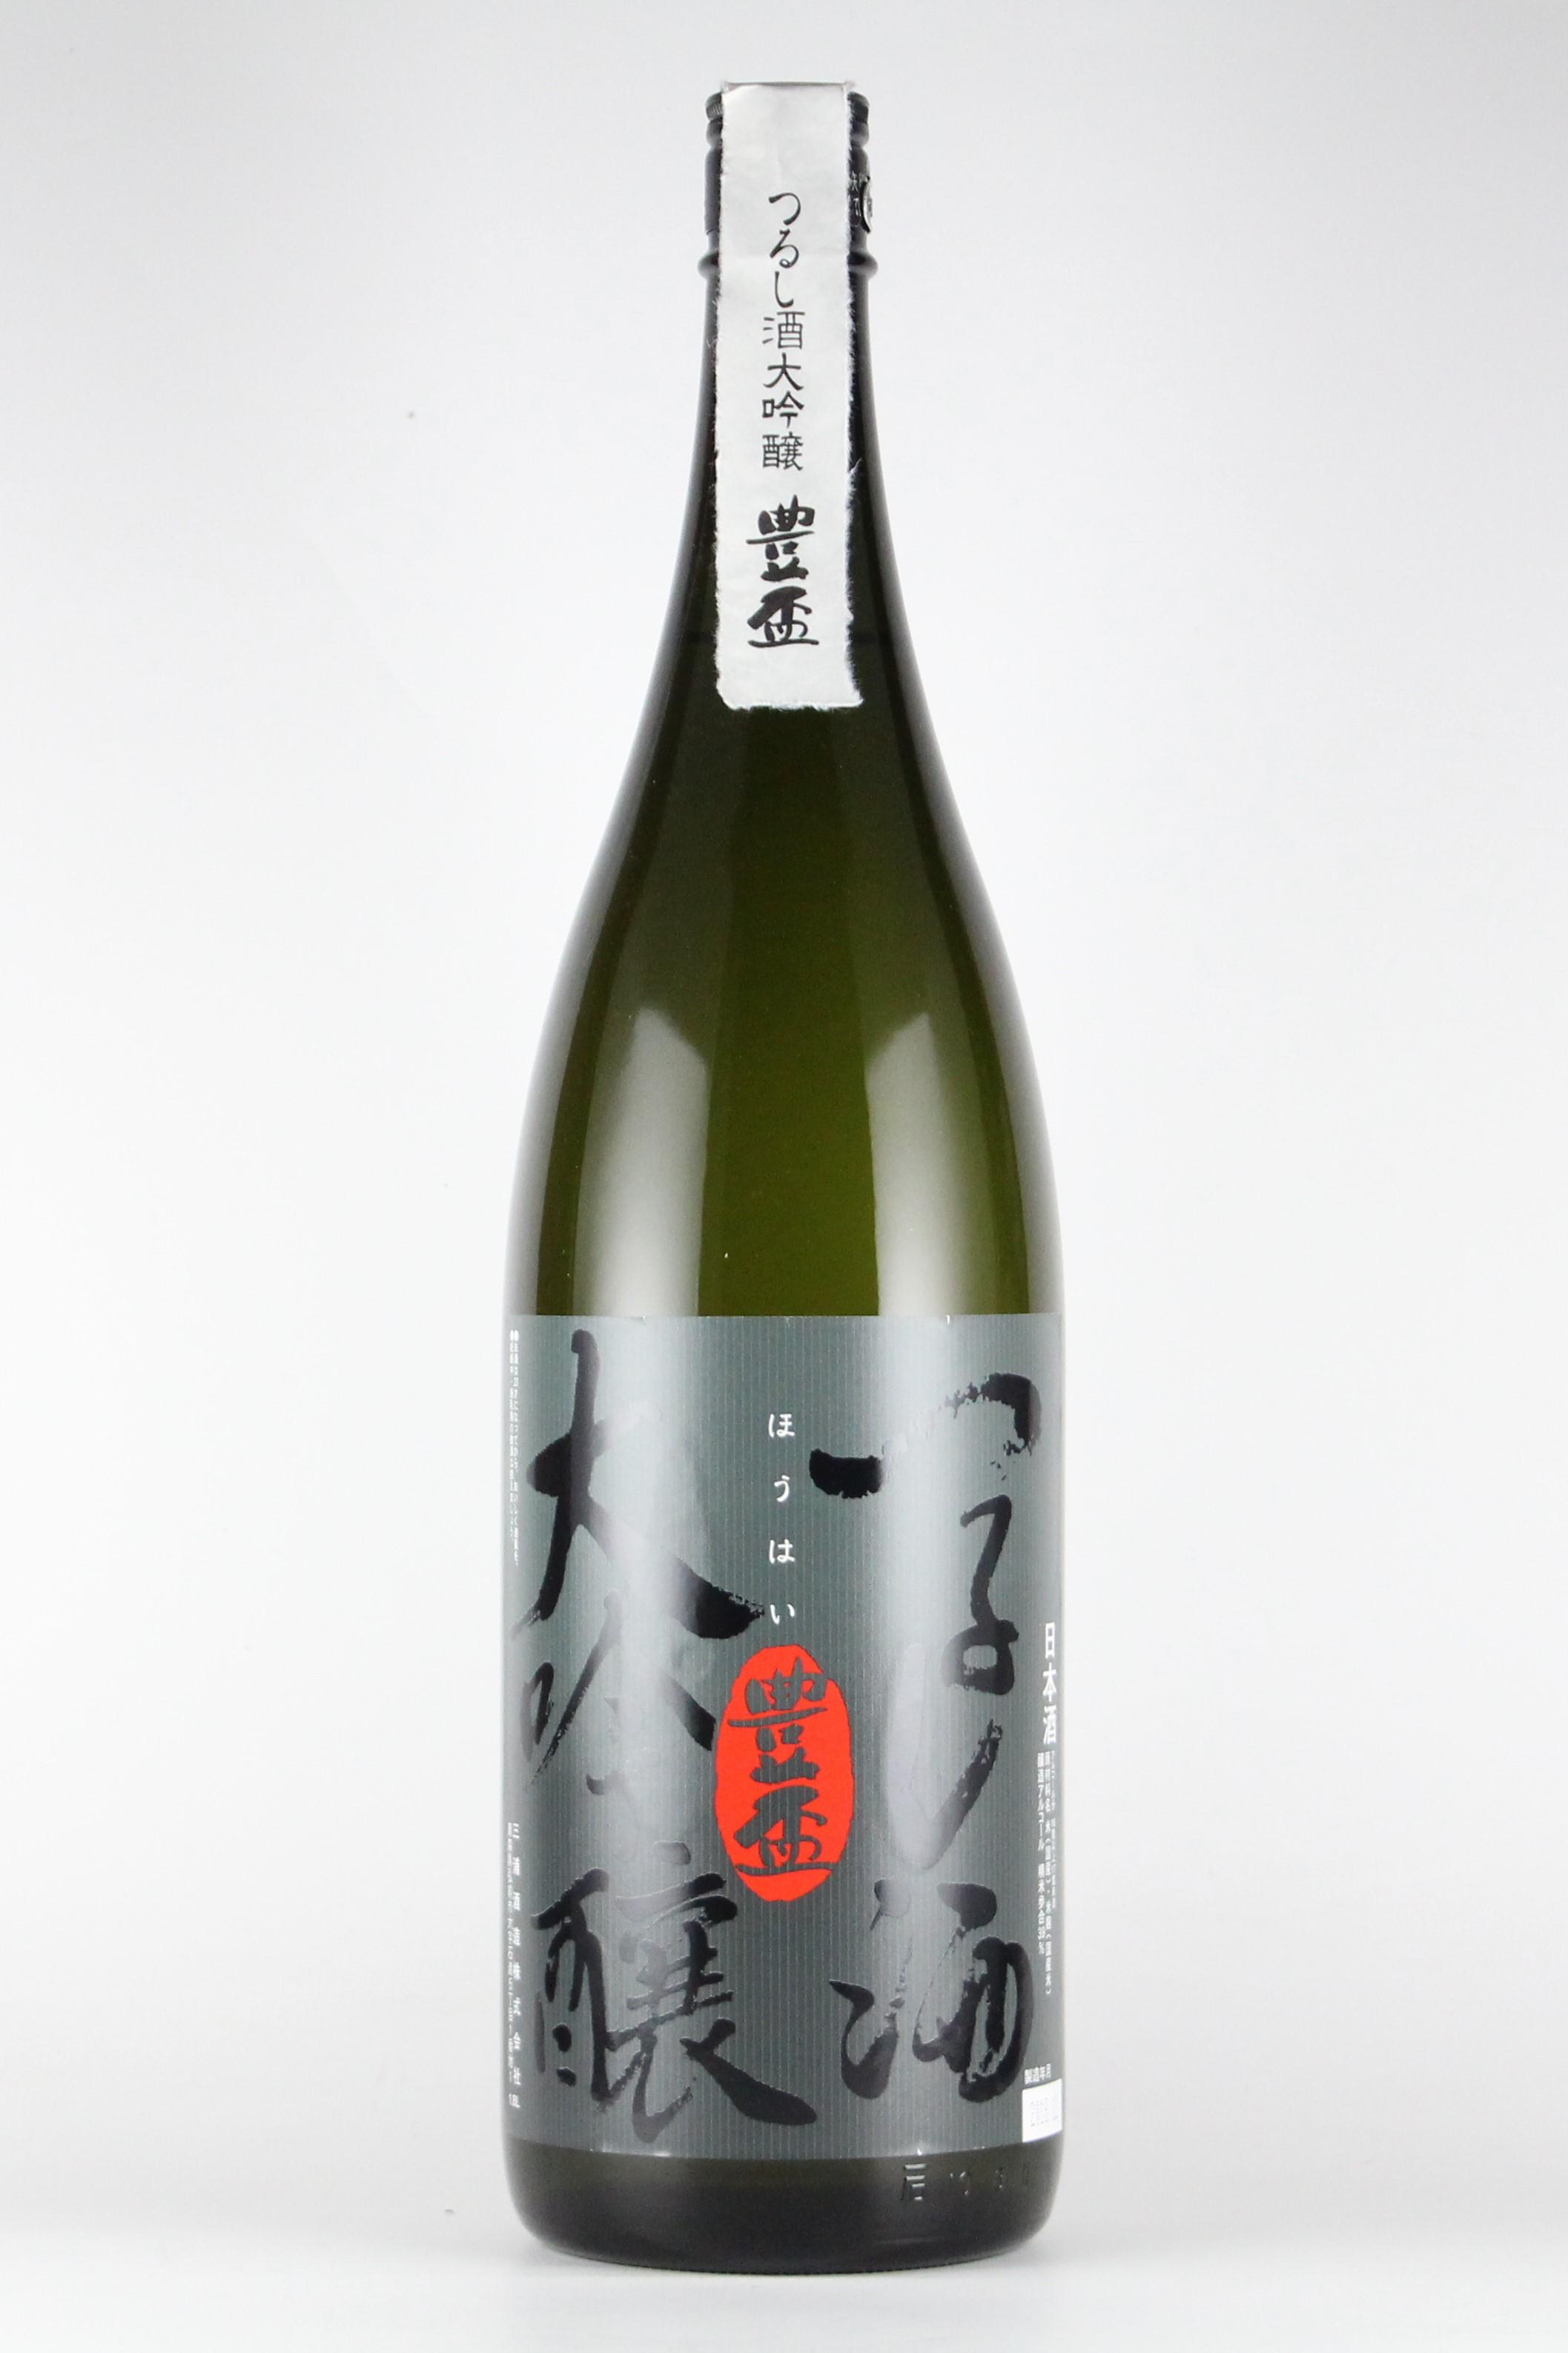 豊盃2018 つるし酒 大吟醸 鑑評会出品酒 1800ml 【青森/三浦酒造】2017(平成29)醸造年度